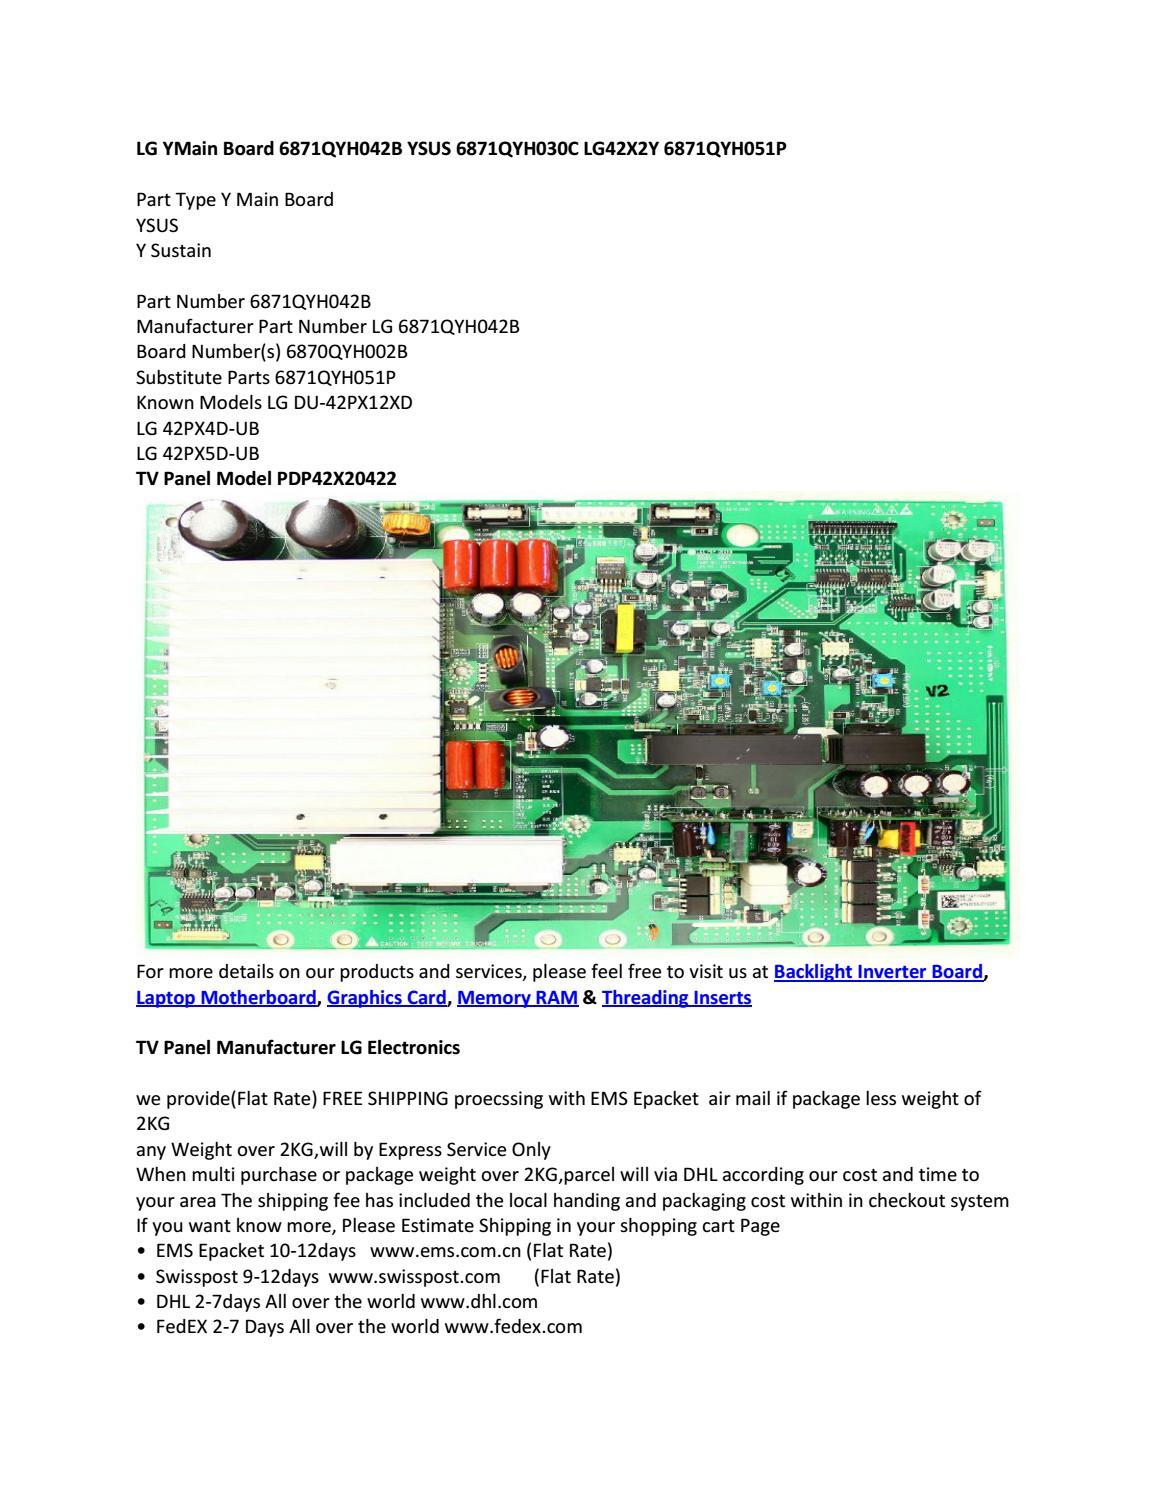 LG YMain Board 6871QYH042B YSUS 6871QYH030C LG42X2Y 6871QYH051P by